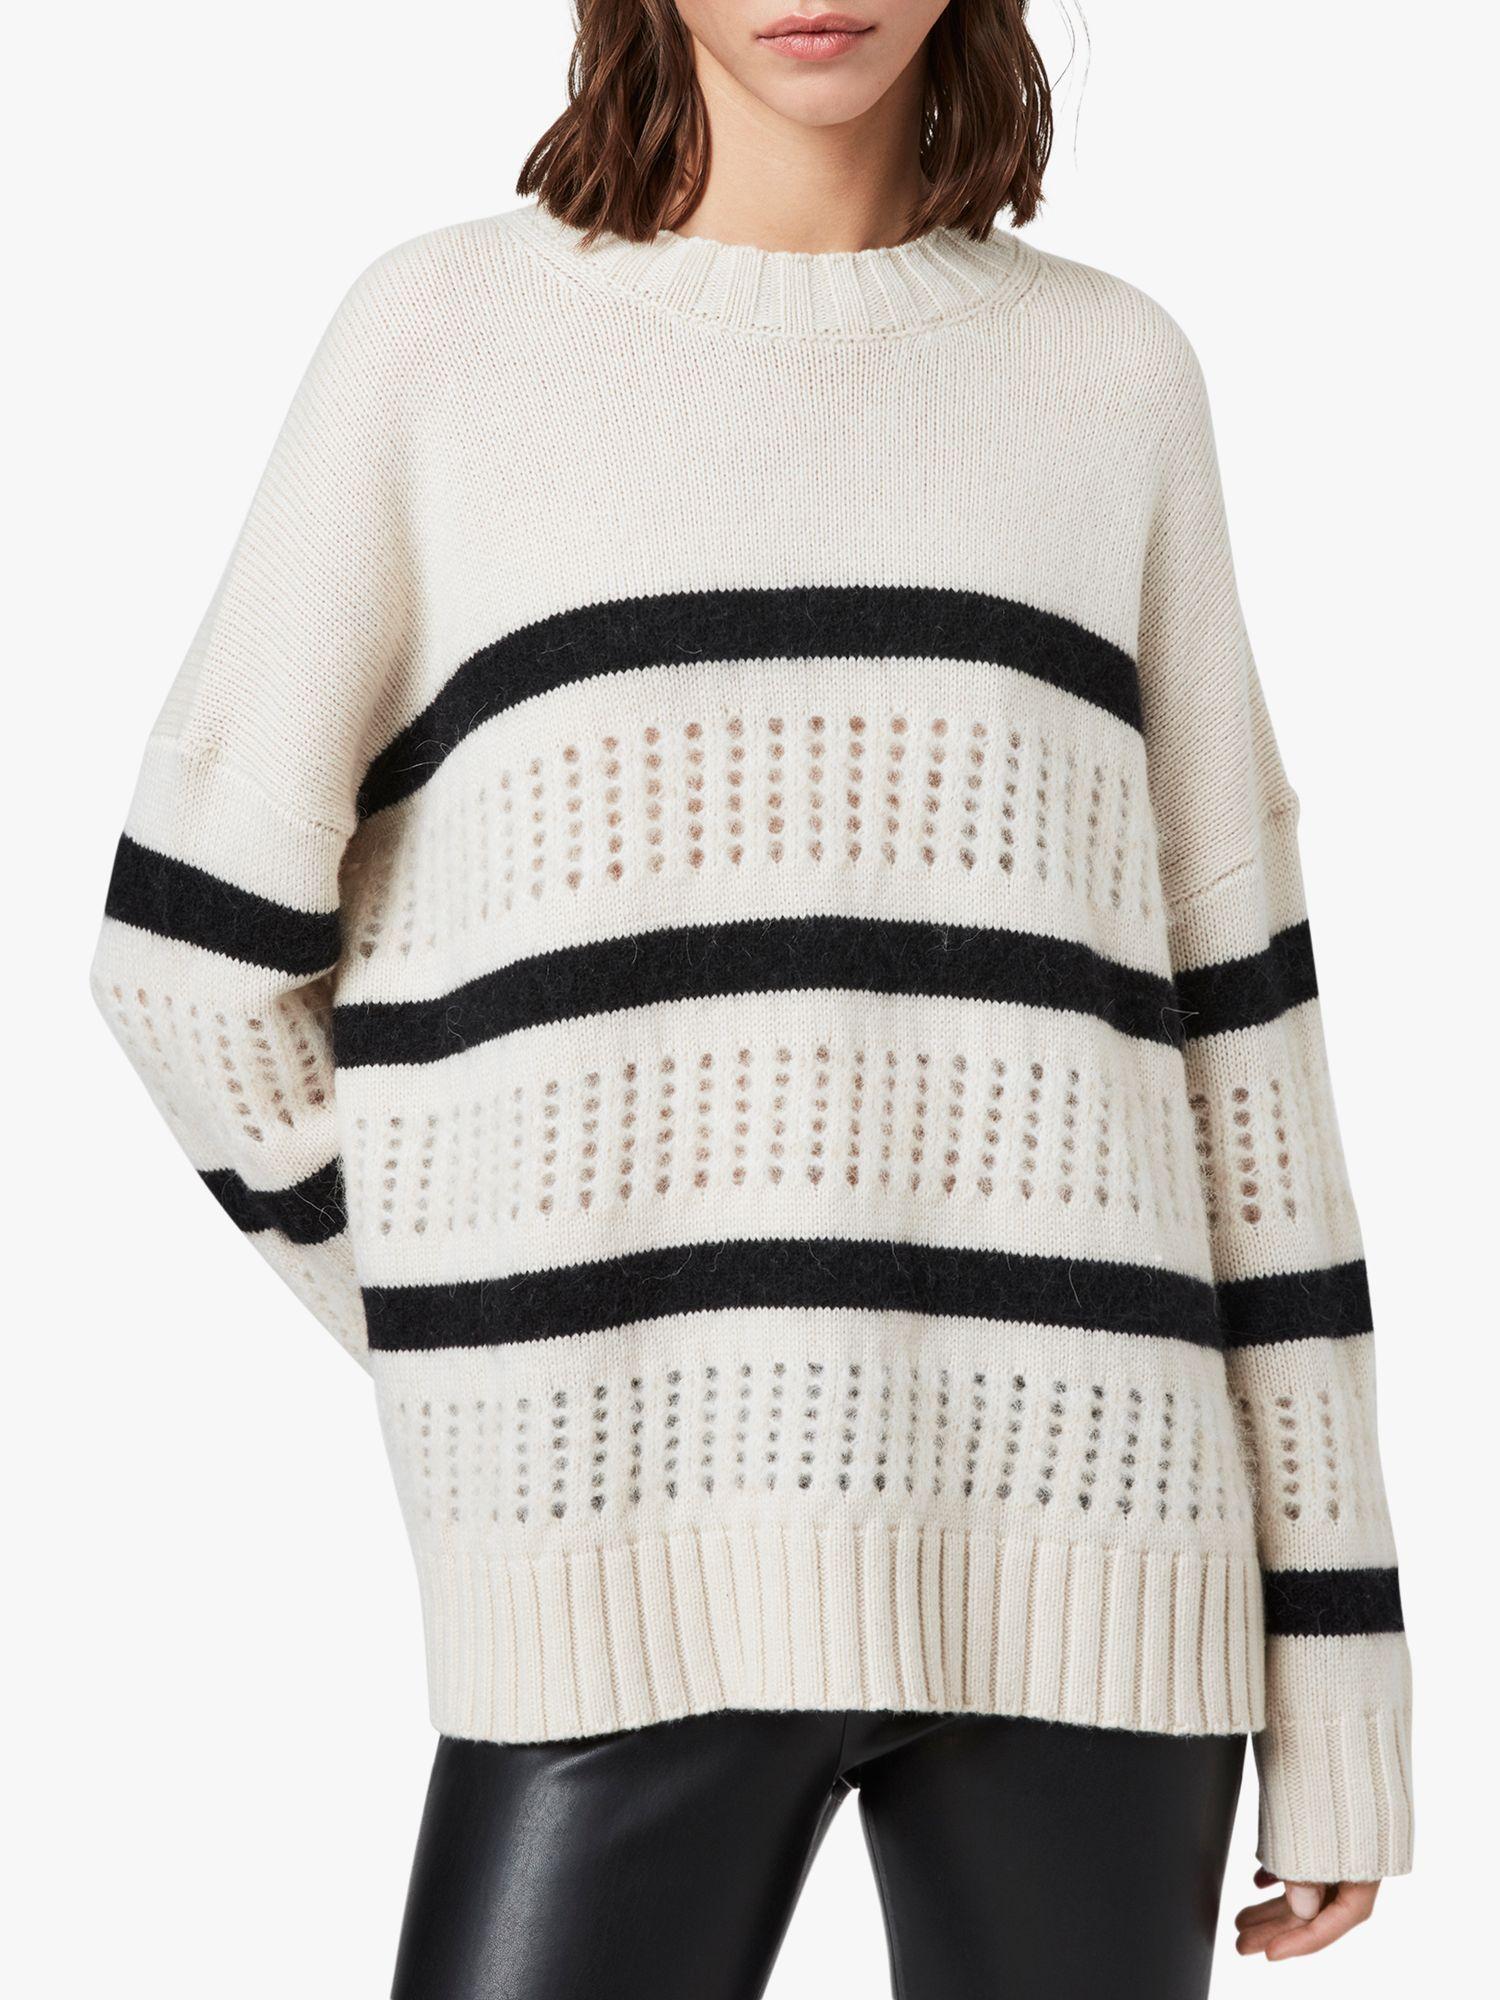 AllSaints AllSaints Siddons Stripe Open Stitch Jumper, Ecru/Black